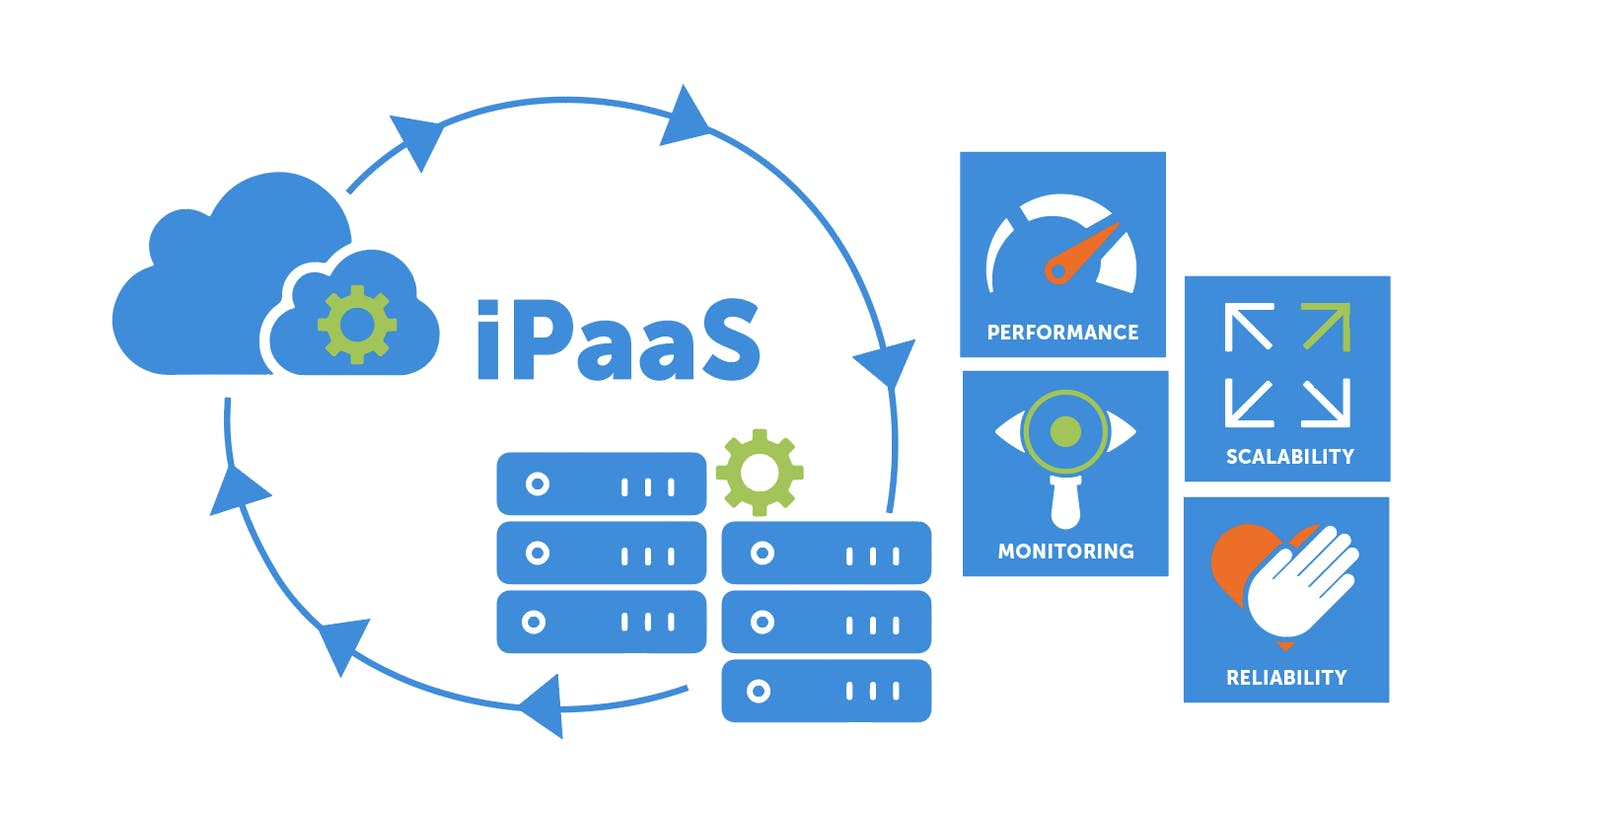 Key Considerations Of IPaaS